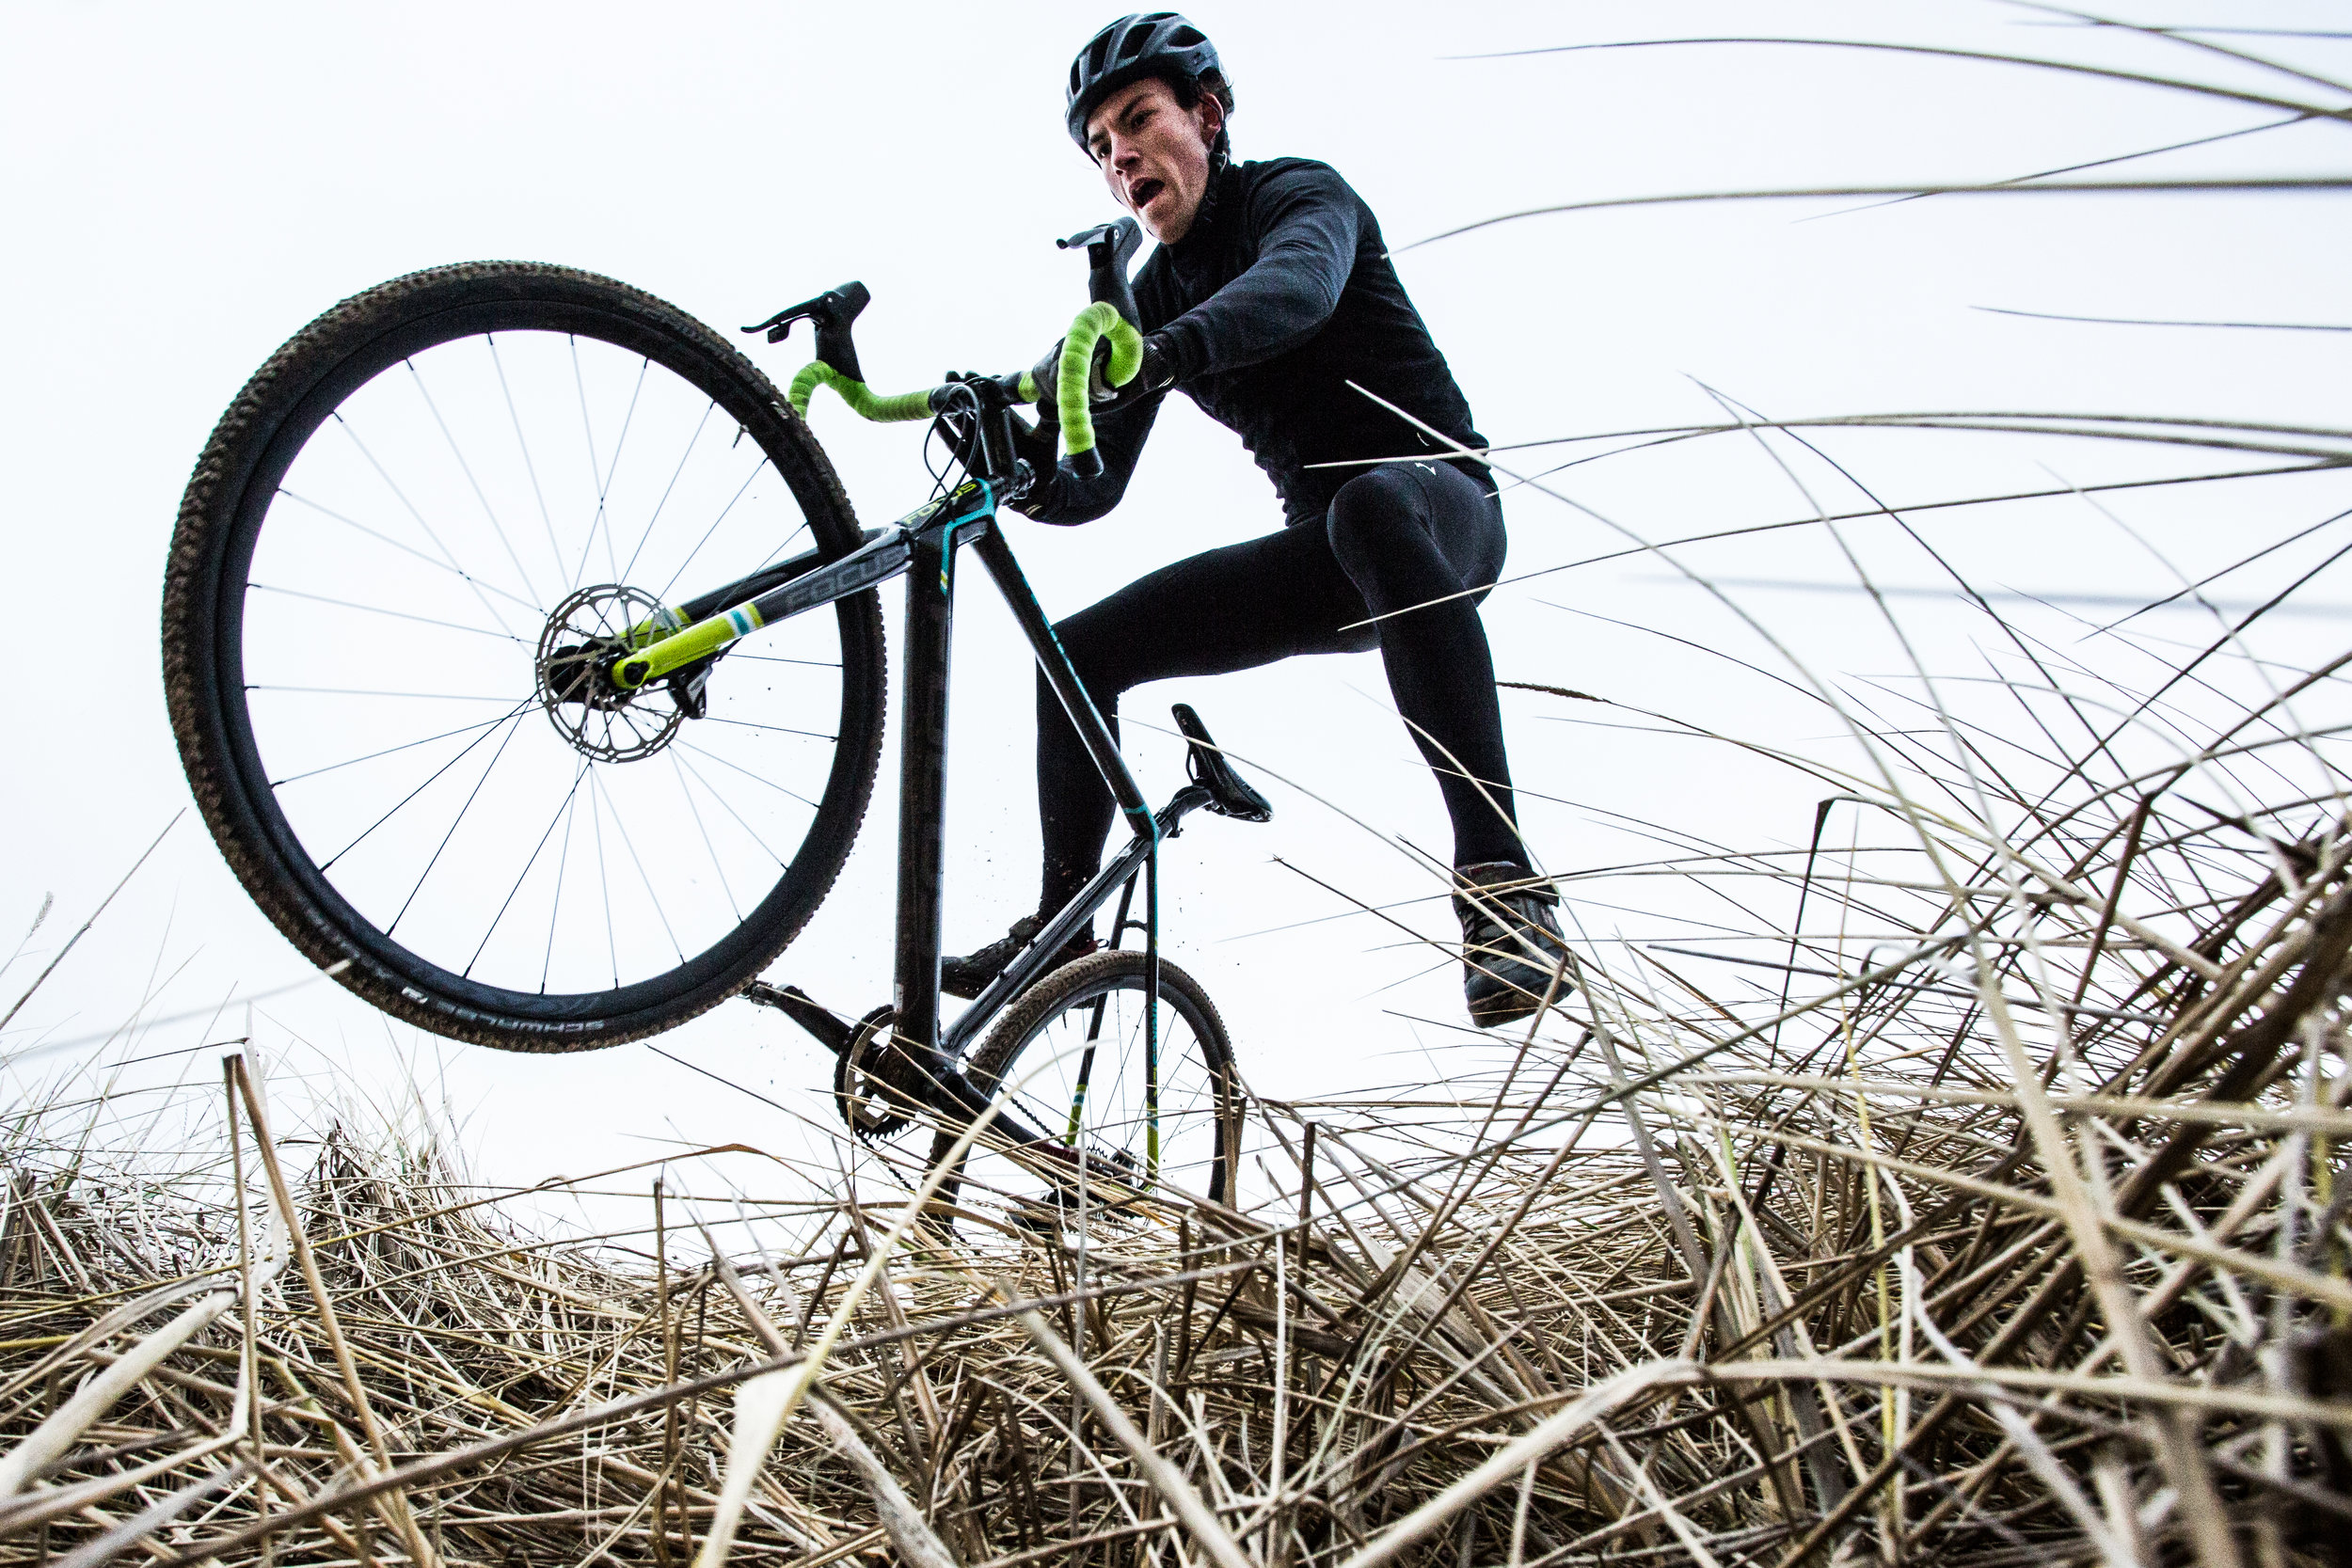 Escapade7_JoeConnell-Cyclocross-15.jpg